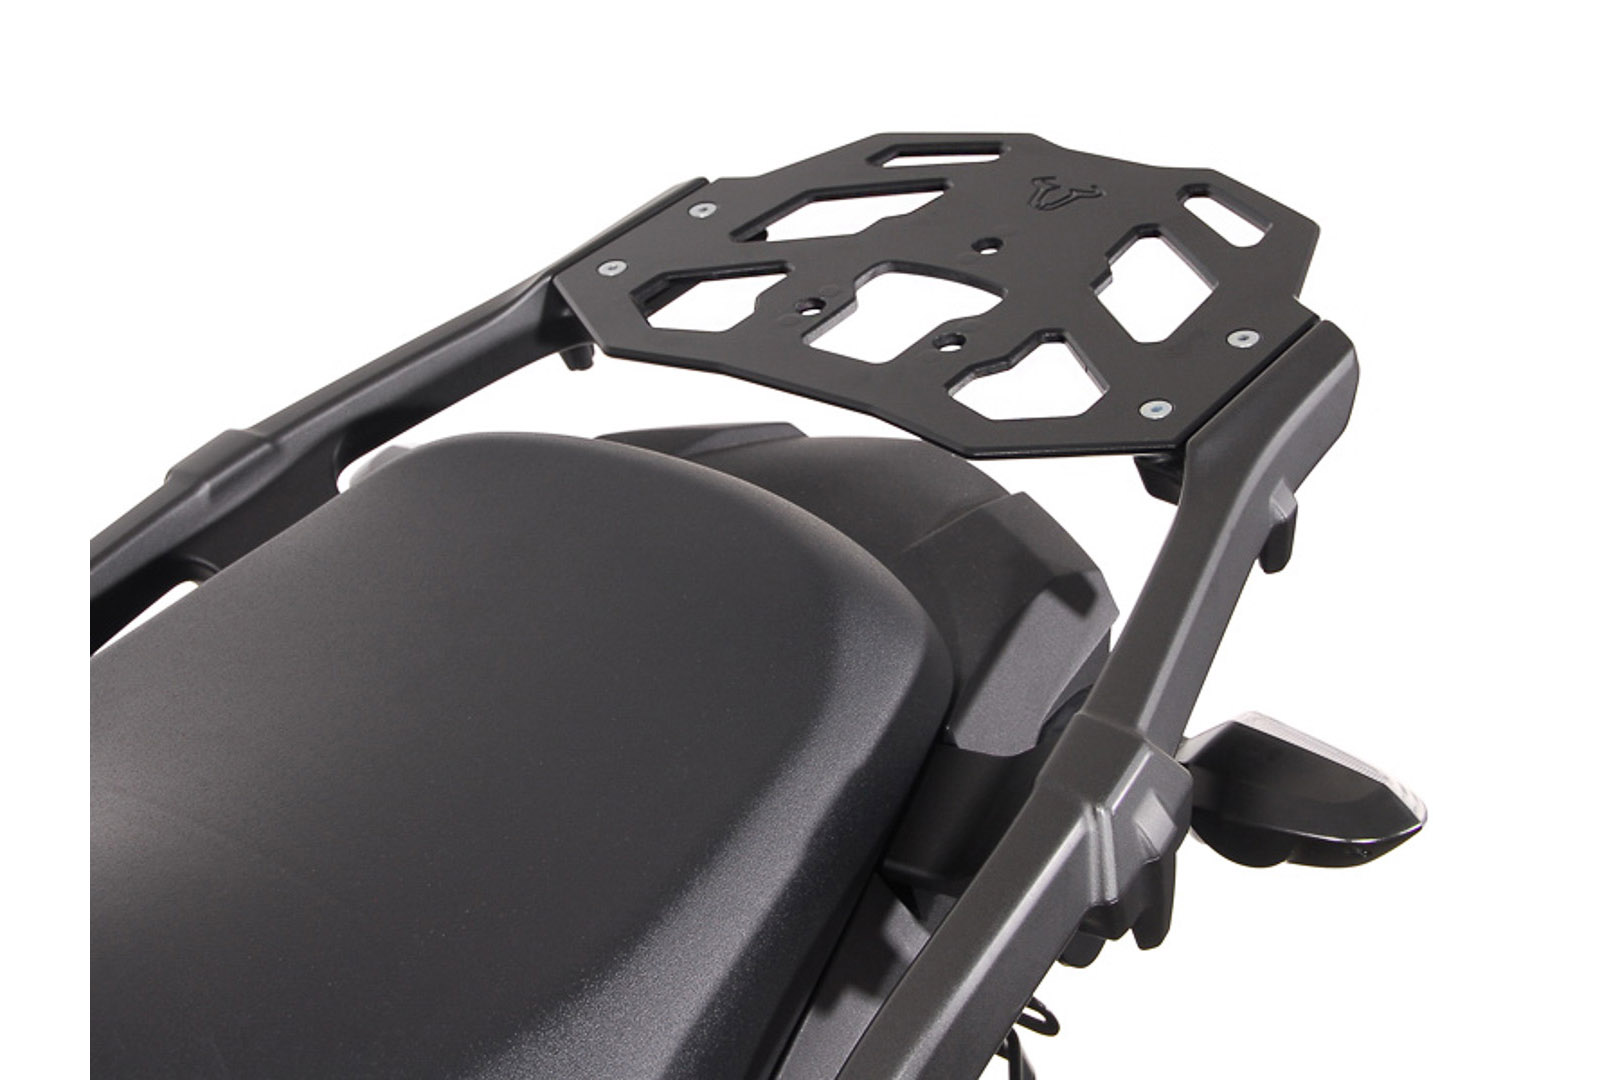 SW-Motech Alu-Rack peräteline Kawasaki Versys 1000, musta